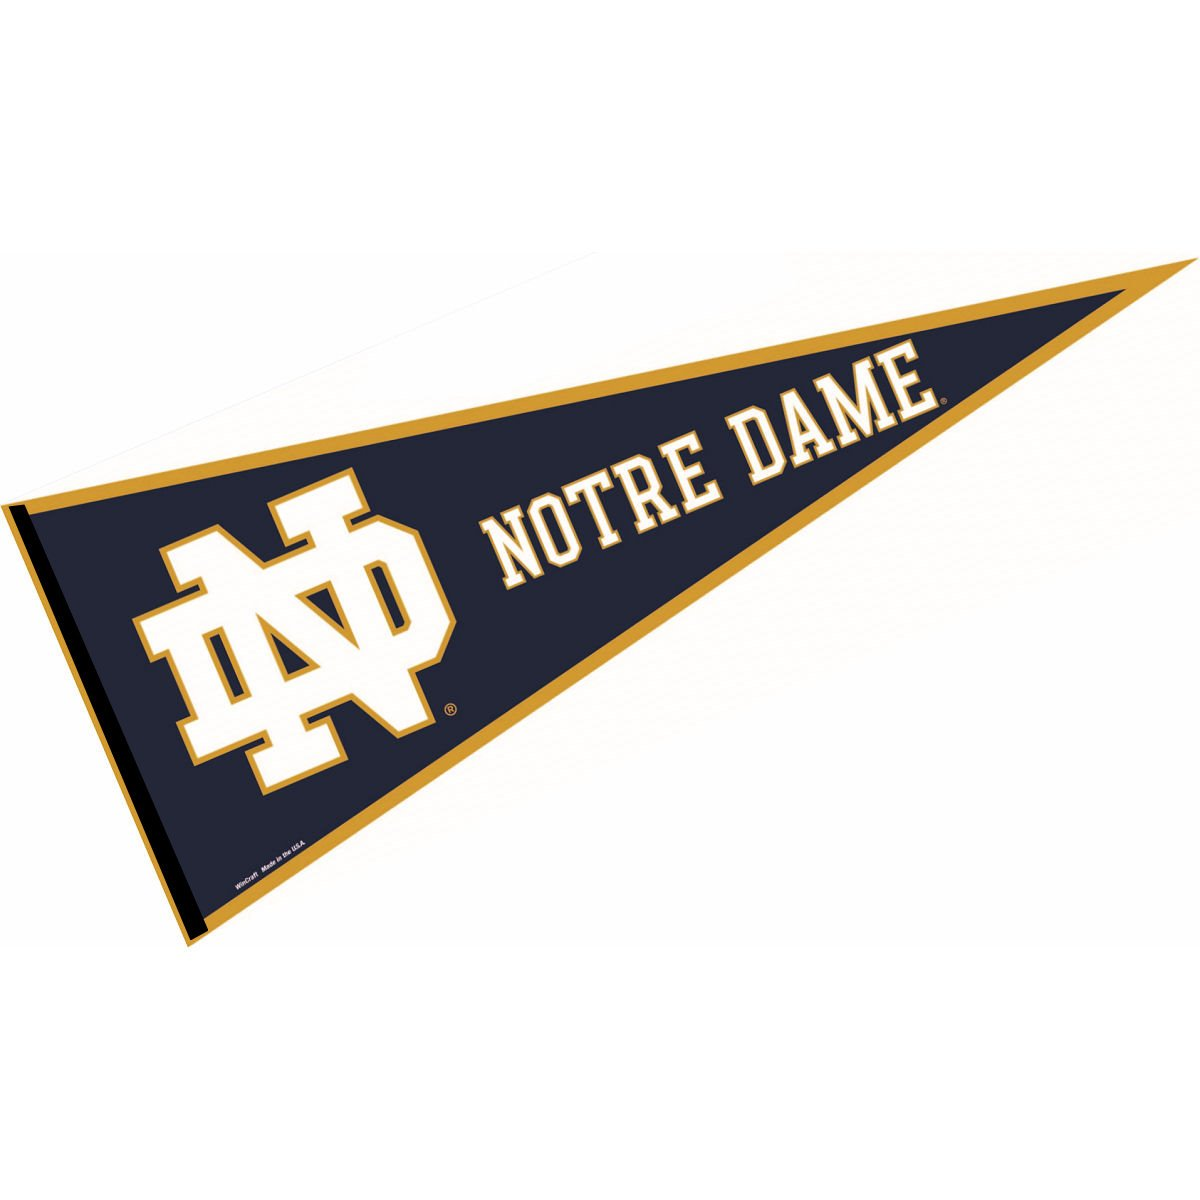 Amazon.com : Notre Dame Pennant Full Size Felt : Sports & Outdoors